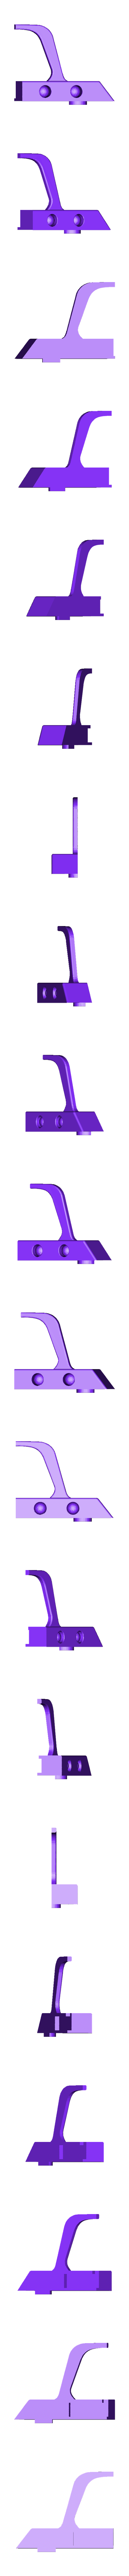 handgrip_left_2.stl Download free STL file 9 gague plasma pistol with barrel tip cover (MPMS mini) • 3D print template, PM_ME_YOUR_VALUE